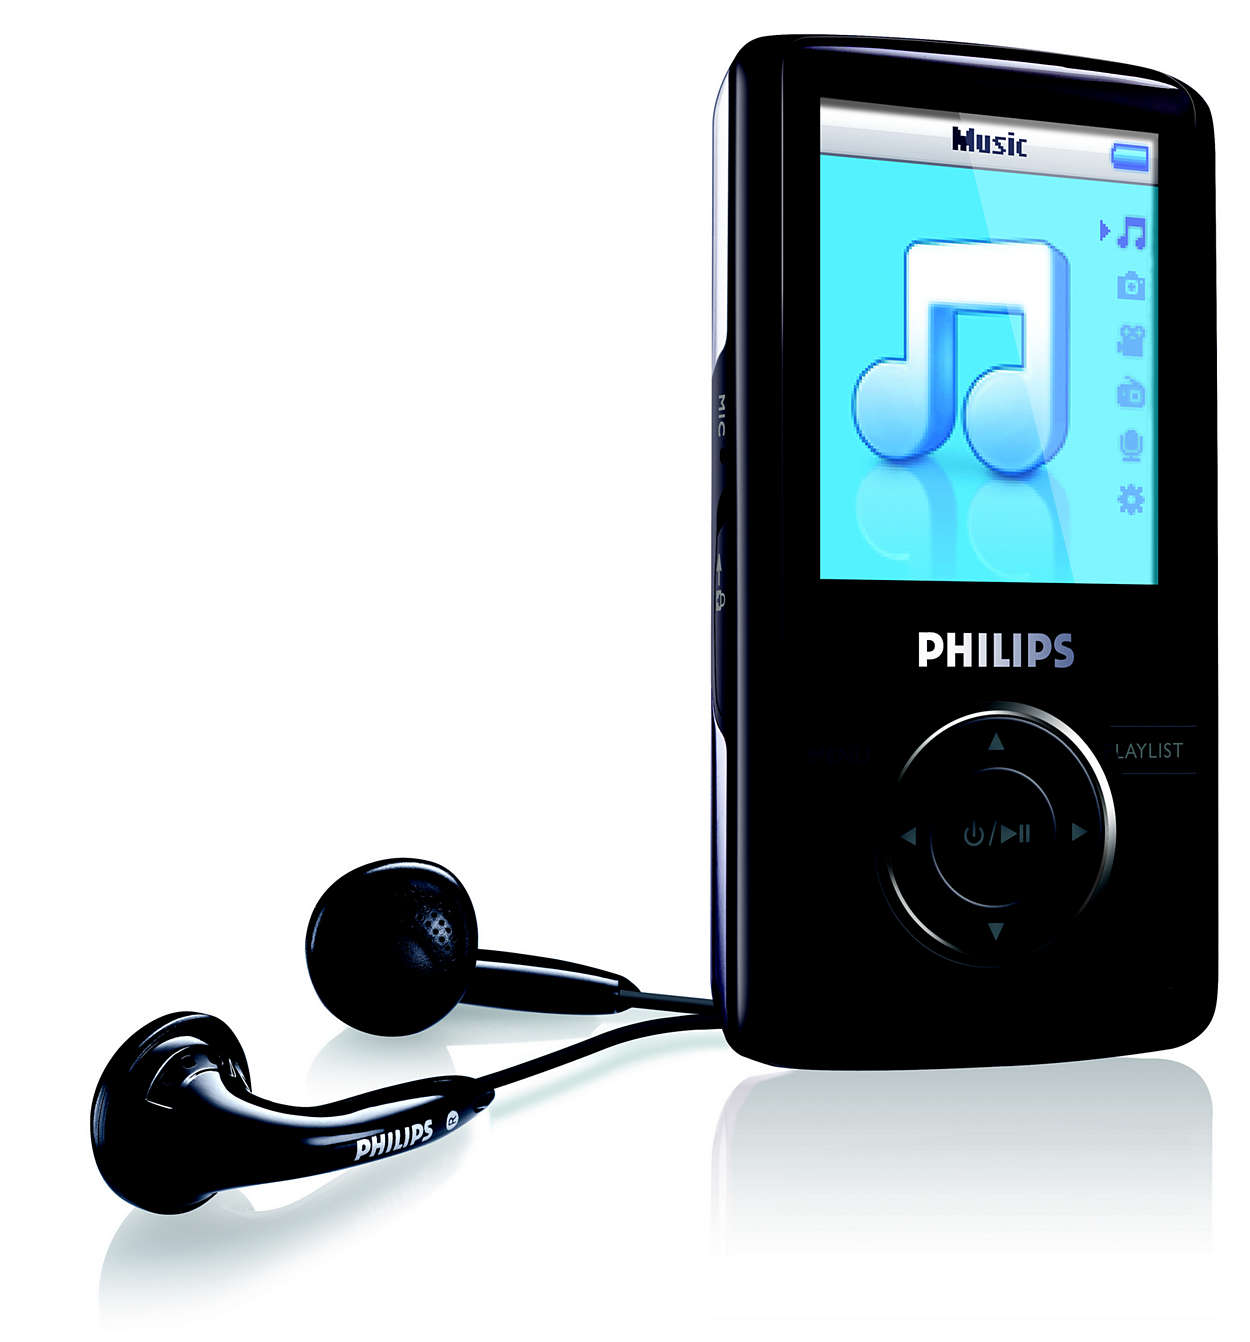 audio video flash player sa3125 02 philips. Black Bedroom Furniture Sets. Home Design Ideas